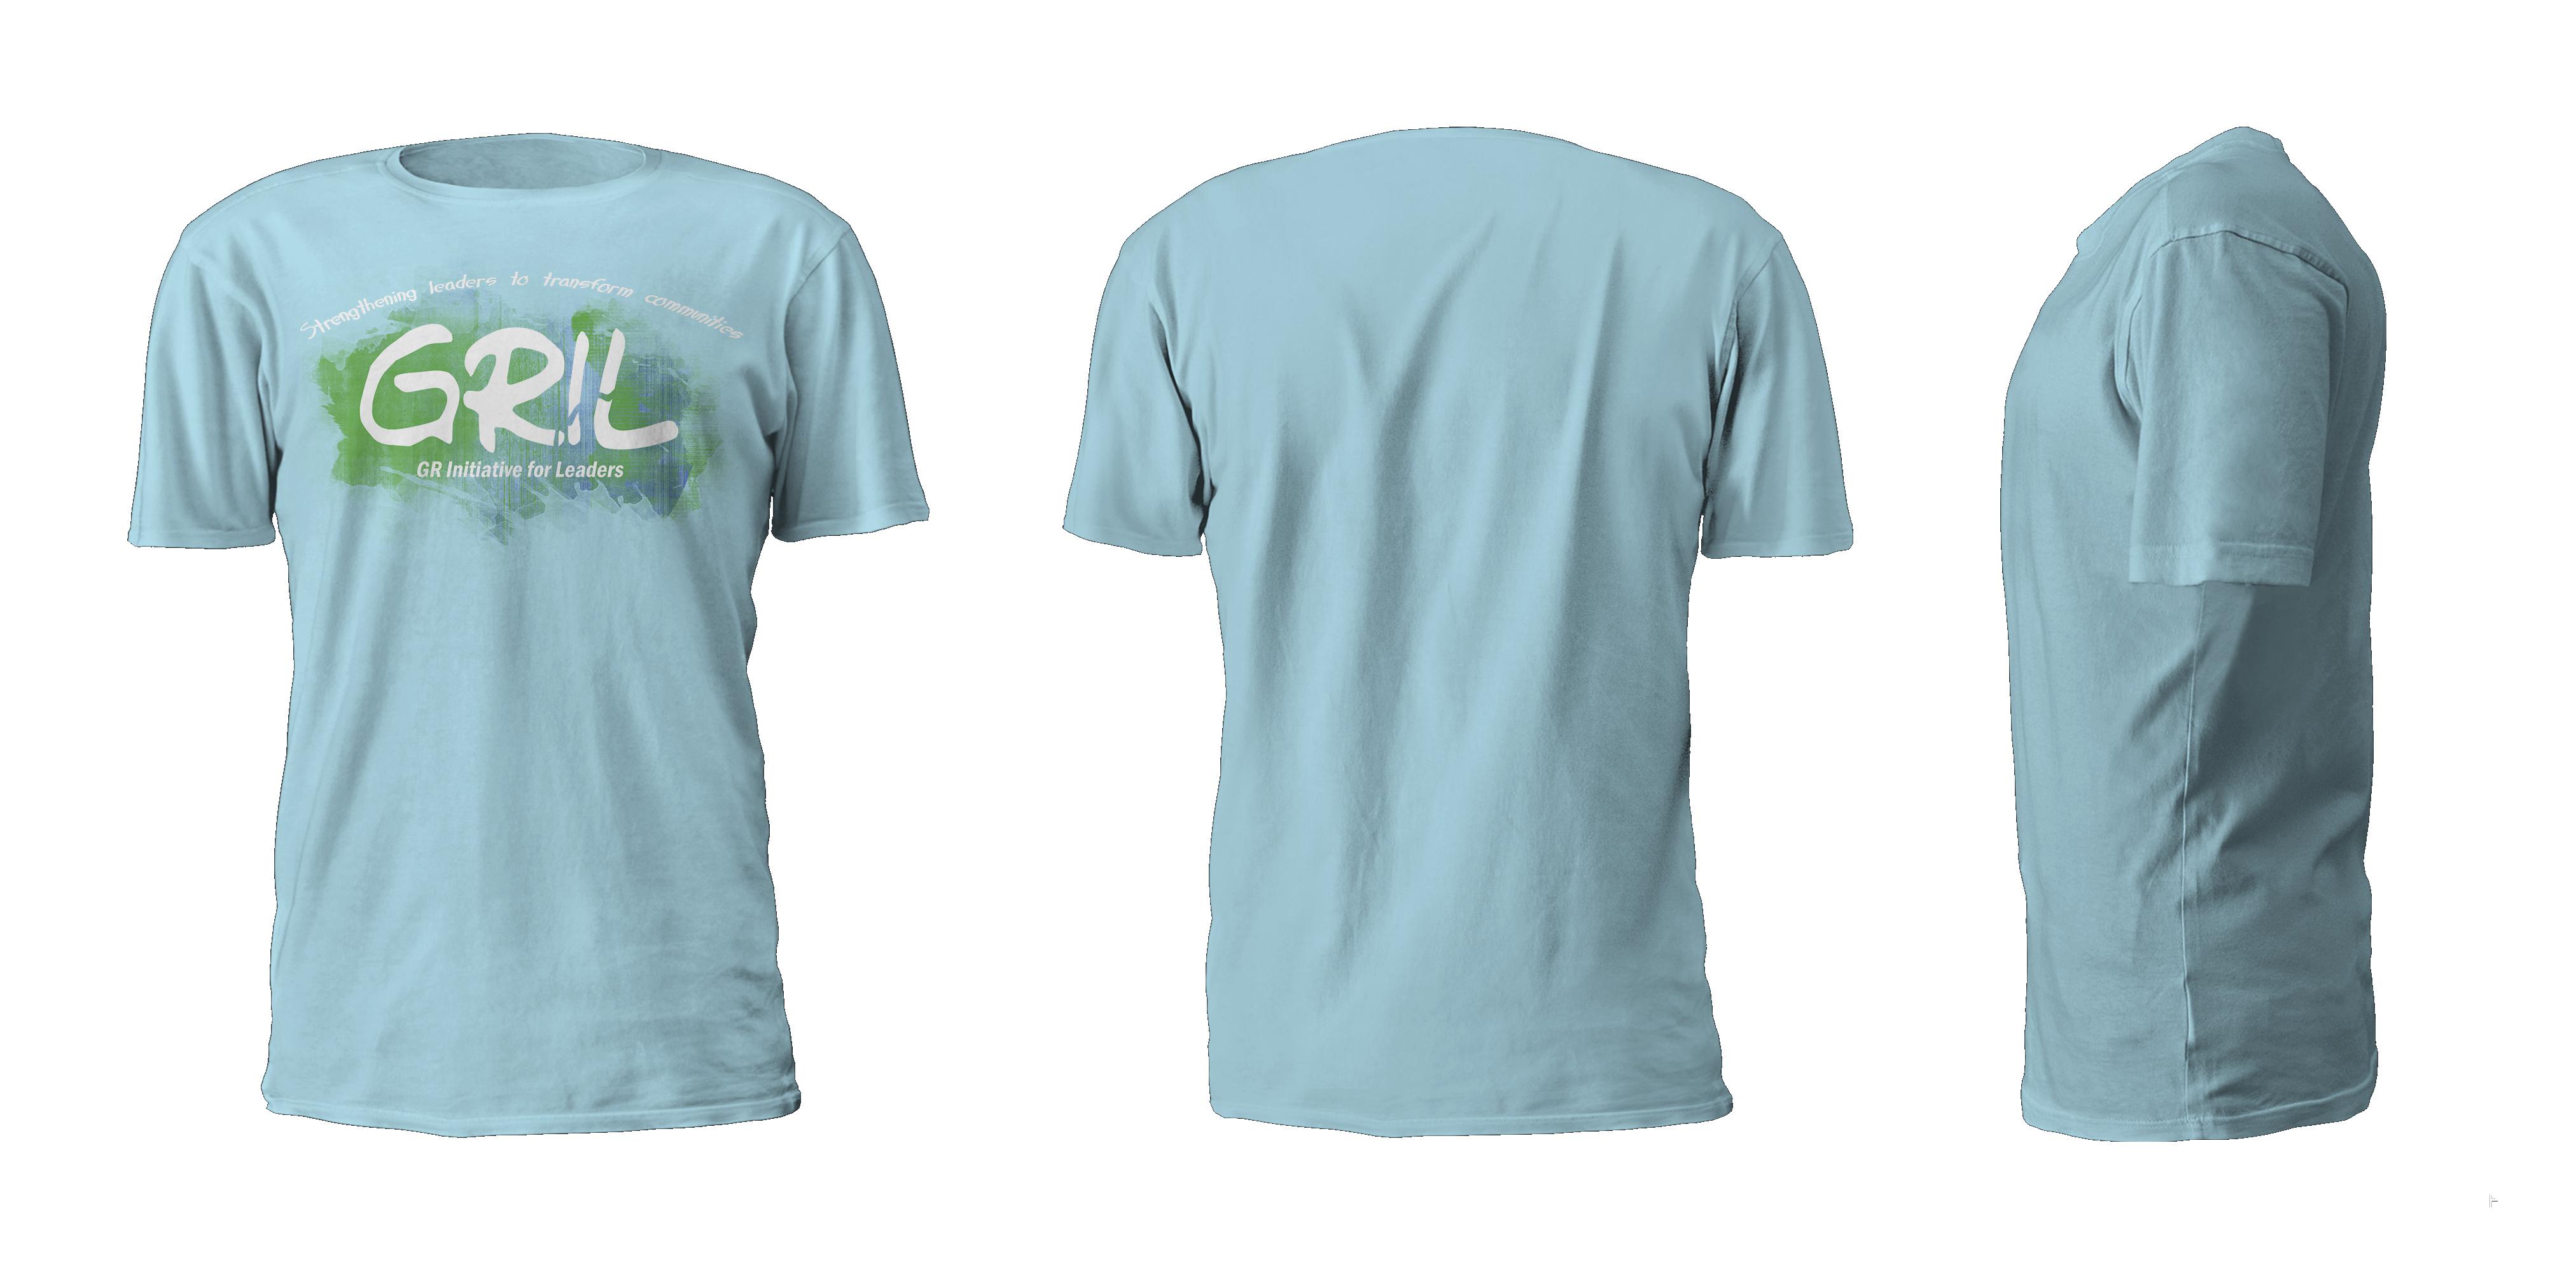 GRIL T-Shirt